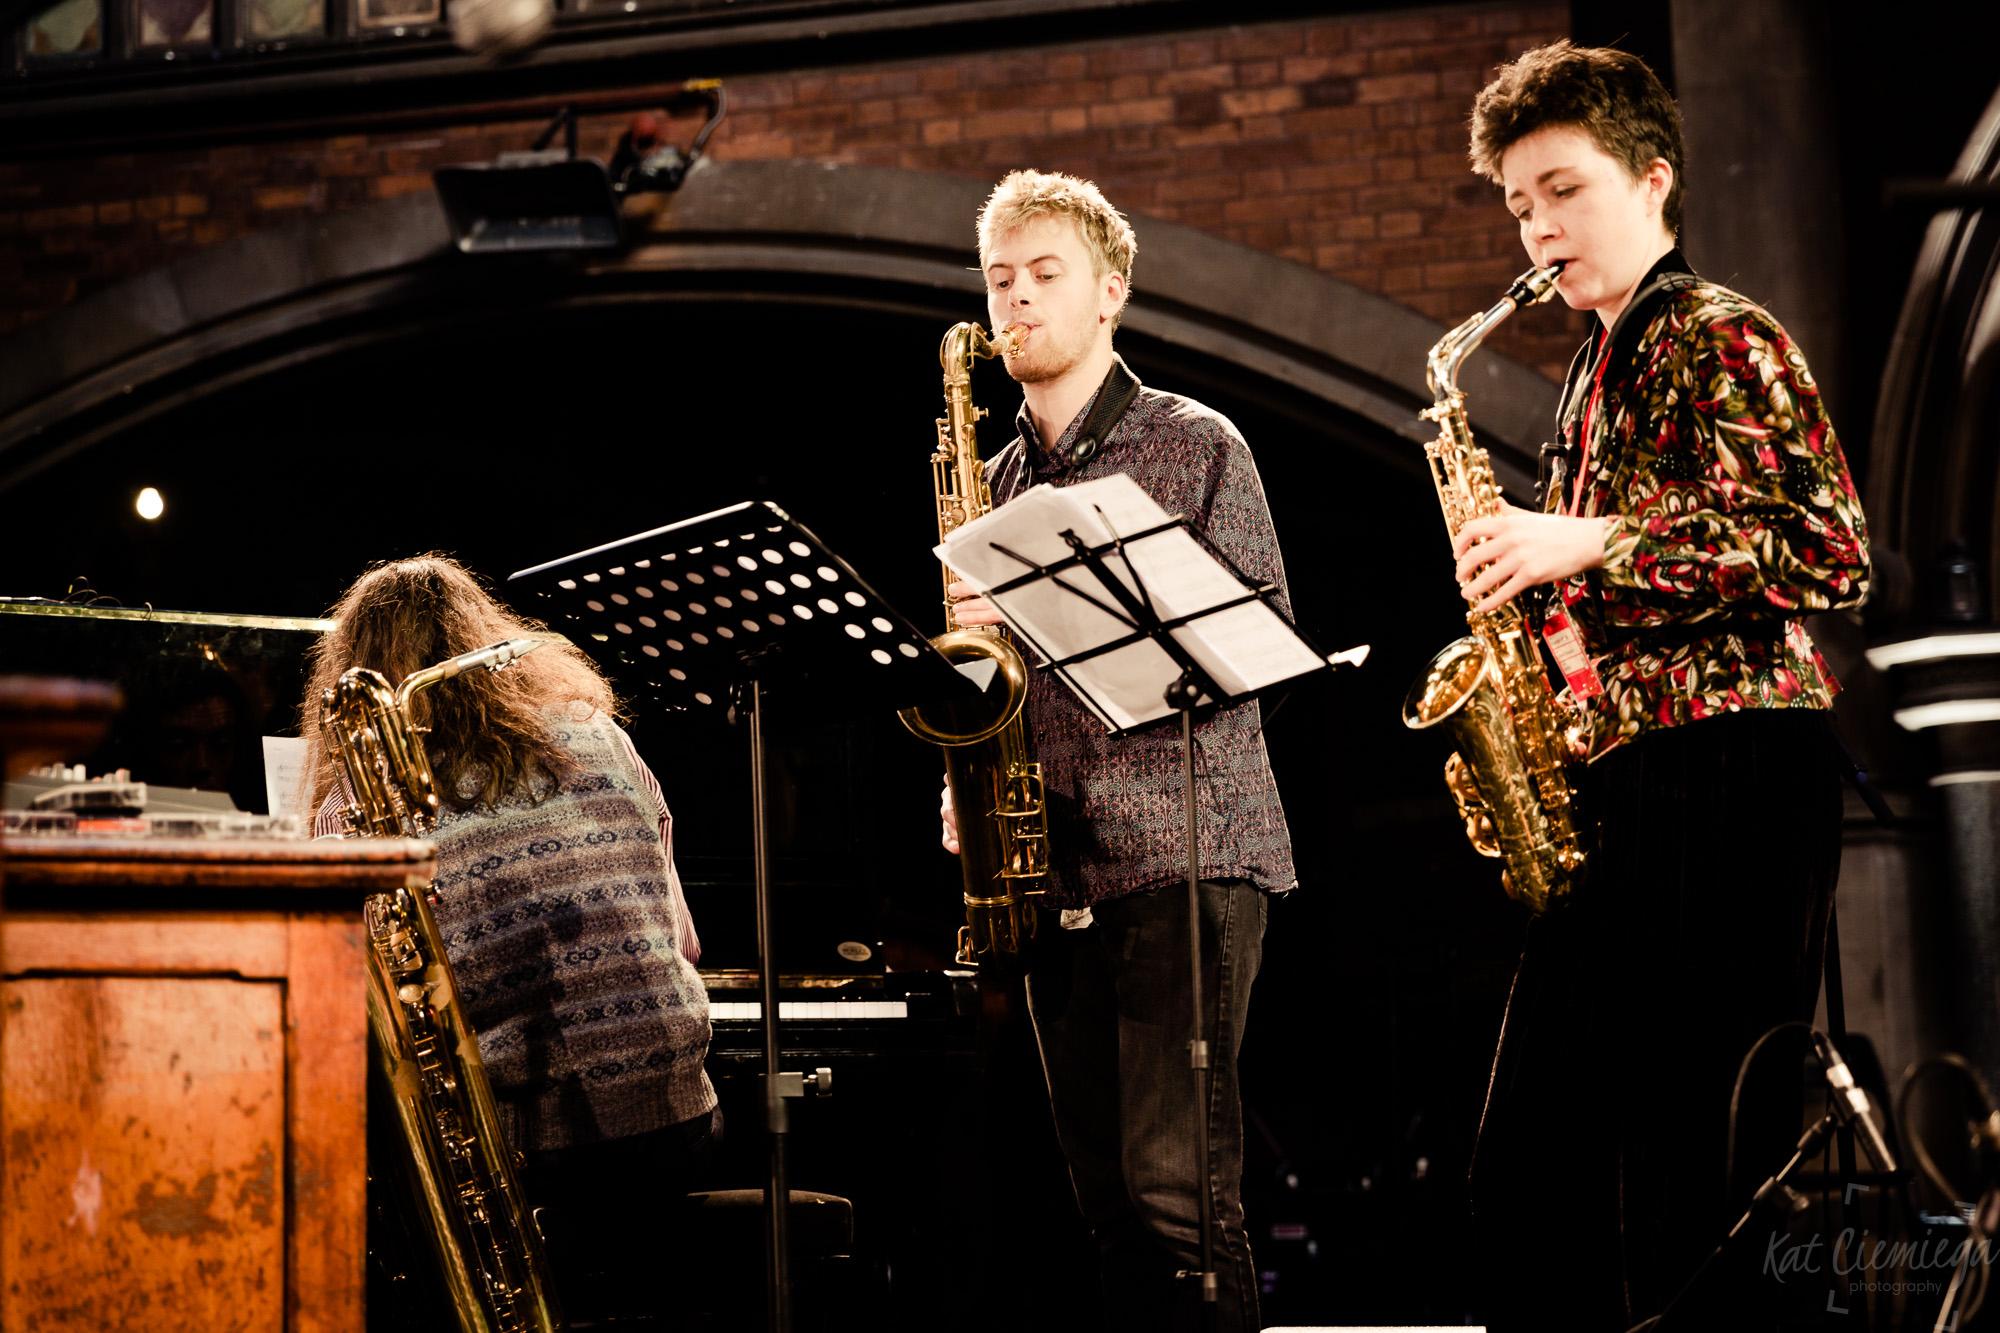 EFG London Jazz Festival, Daylight Music, concert photographer, event photographer, live music London